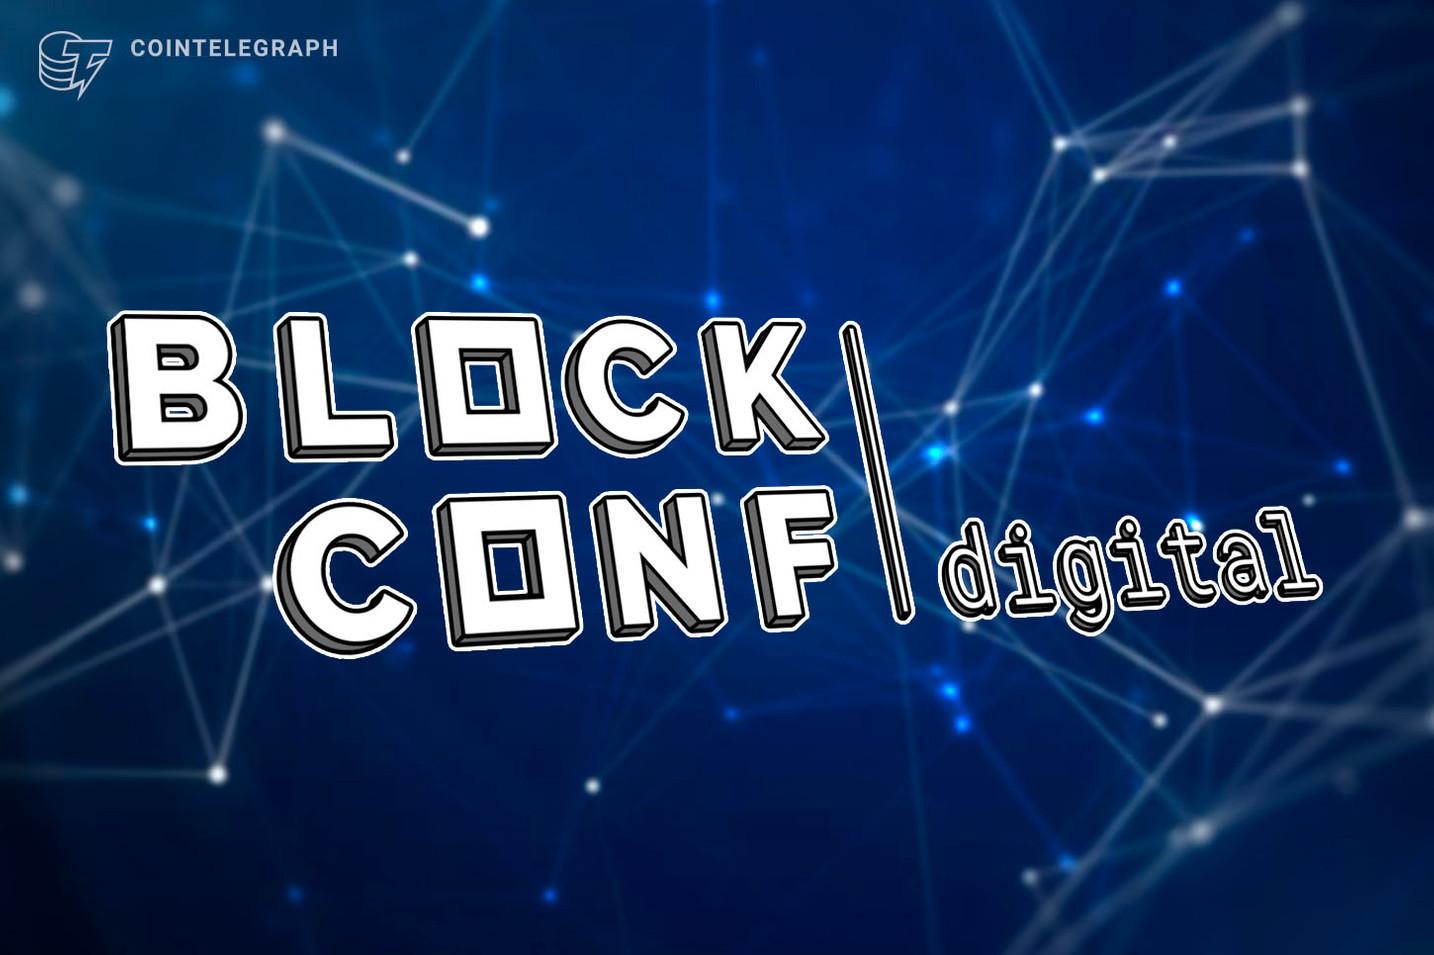 BlockConf DIGITAL, una conferenza online gratuita dedicata alla blockchain